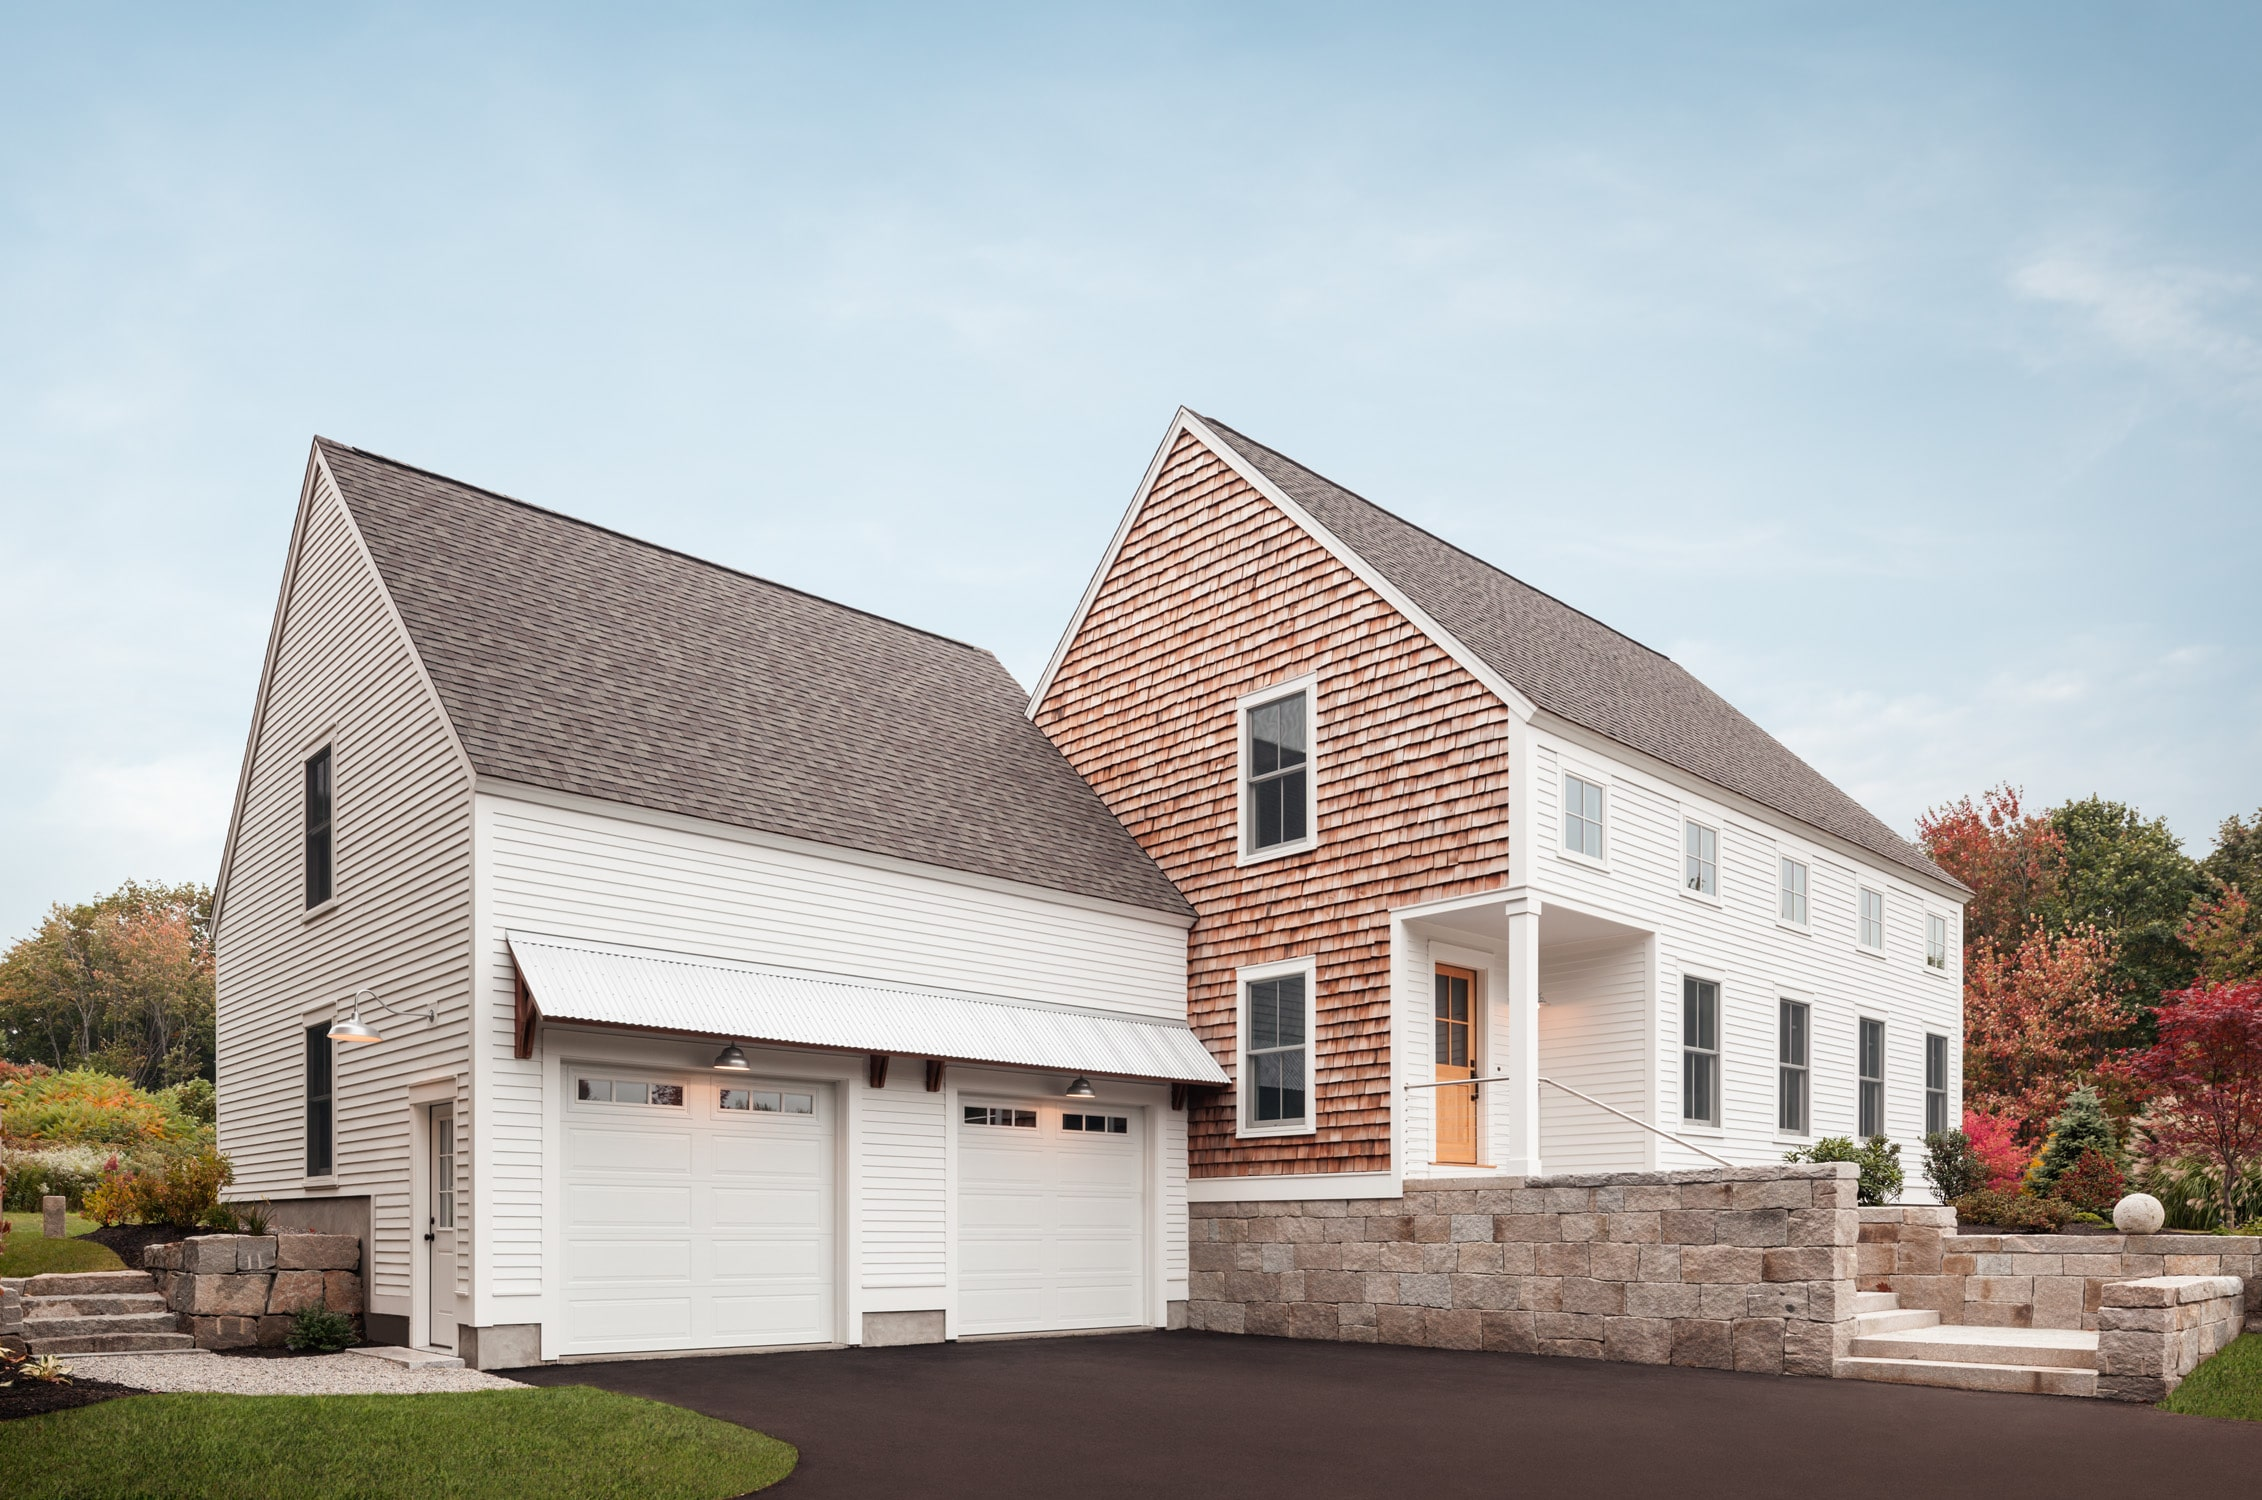 Builder's House